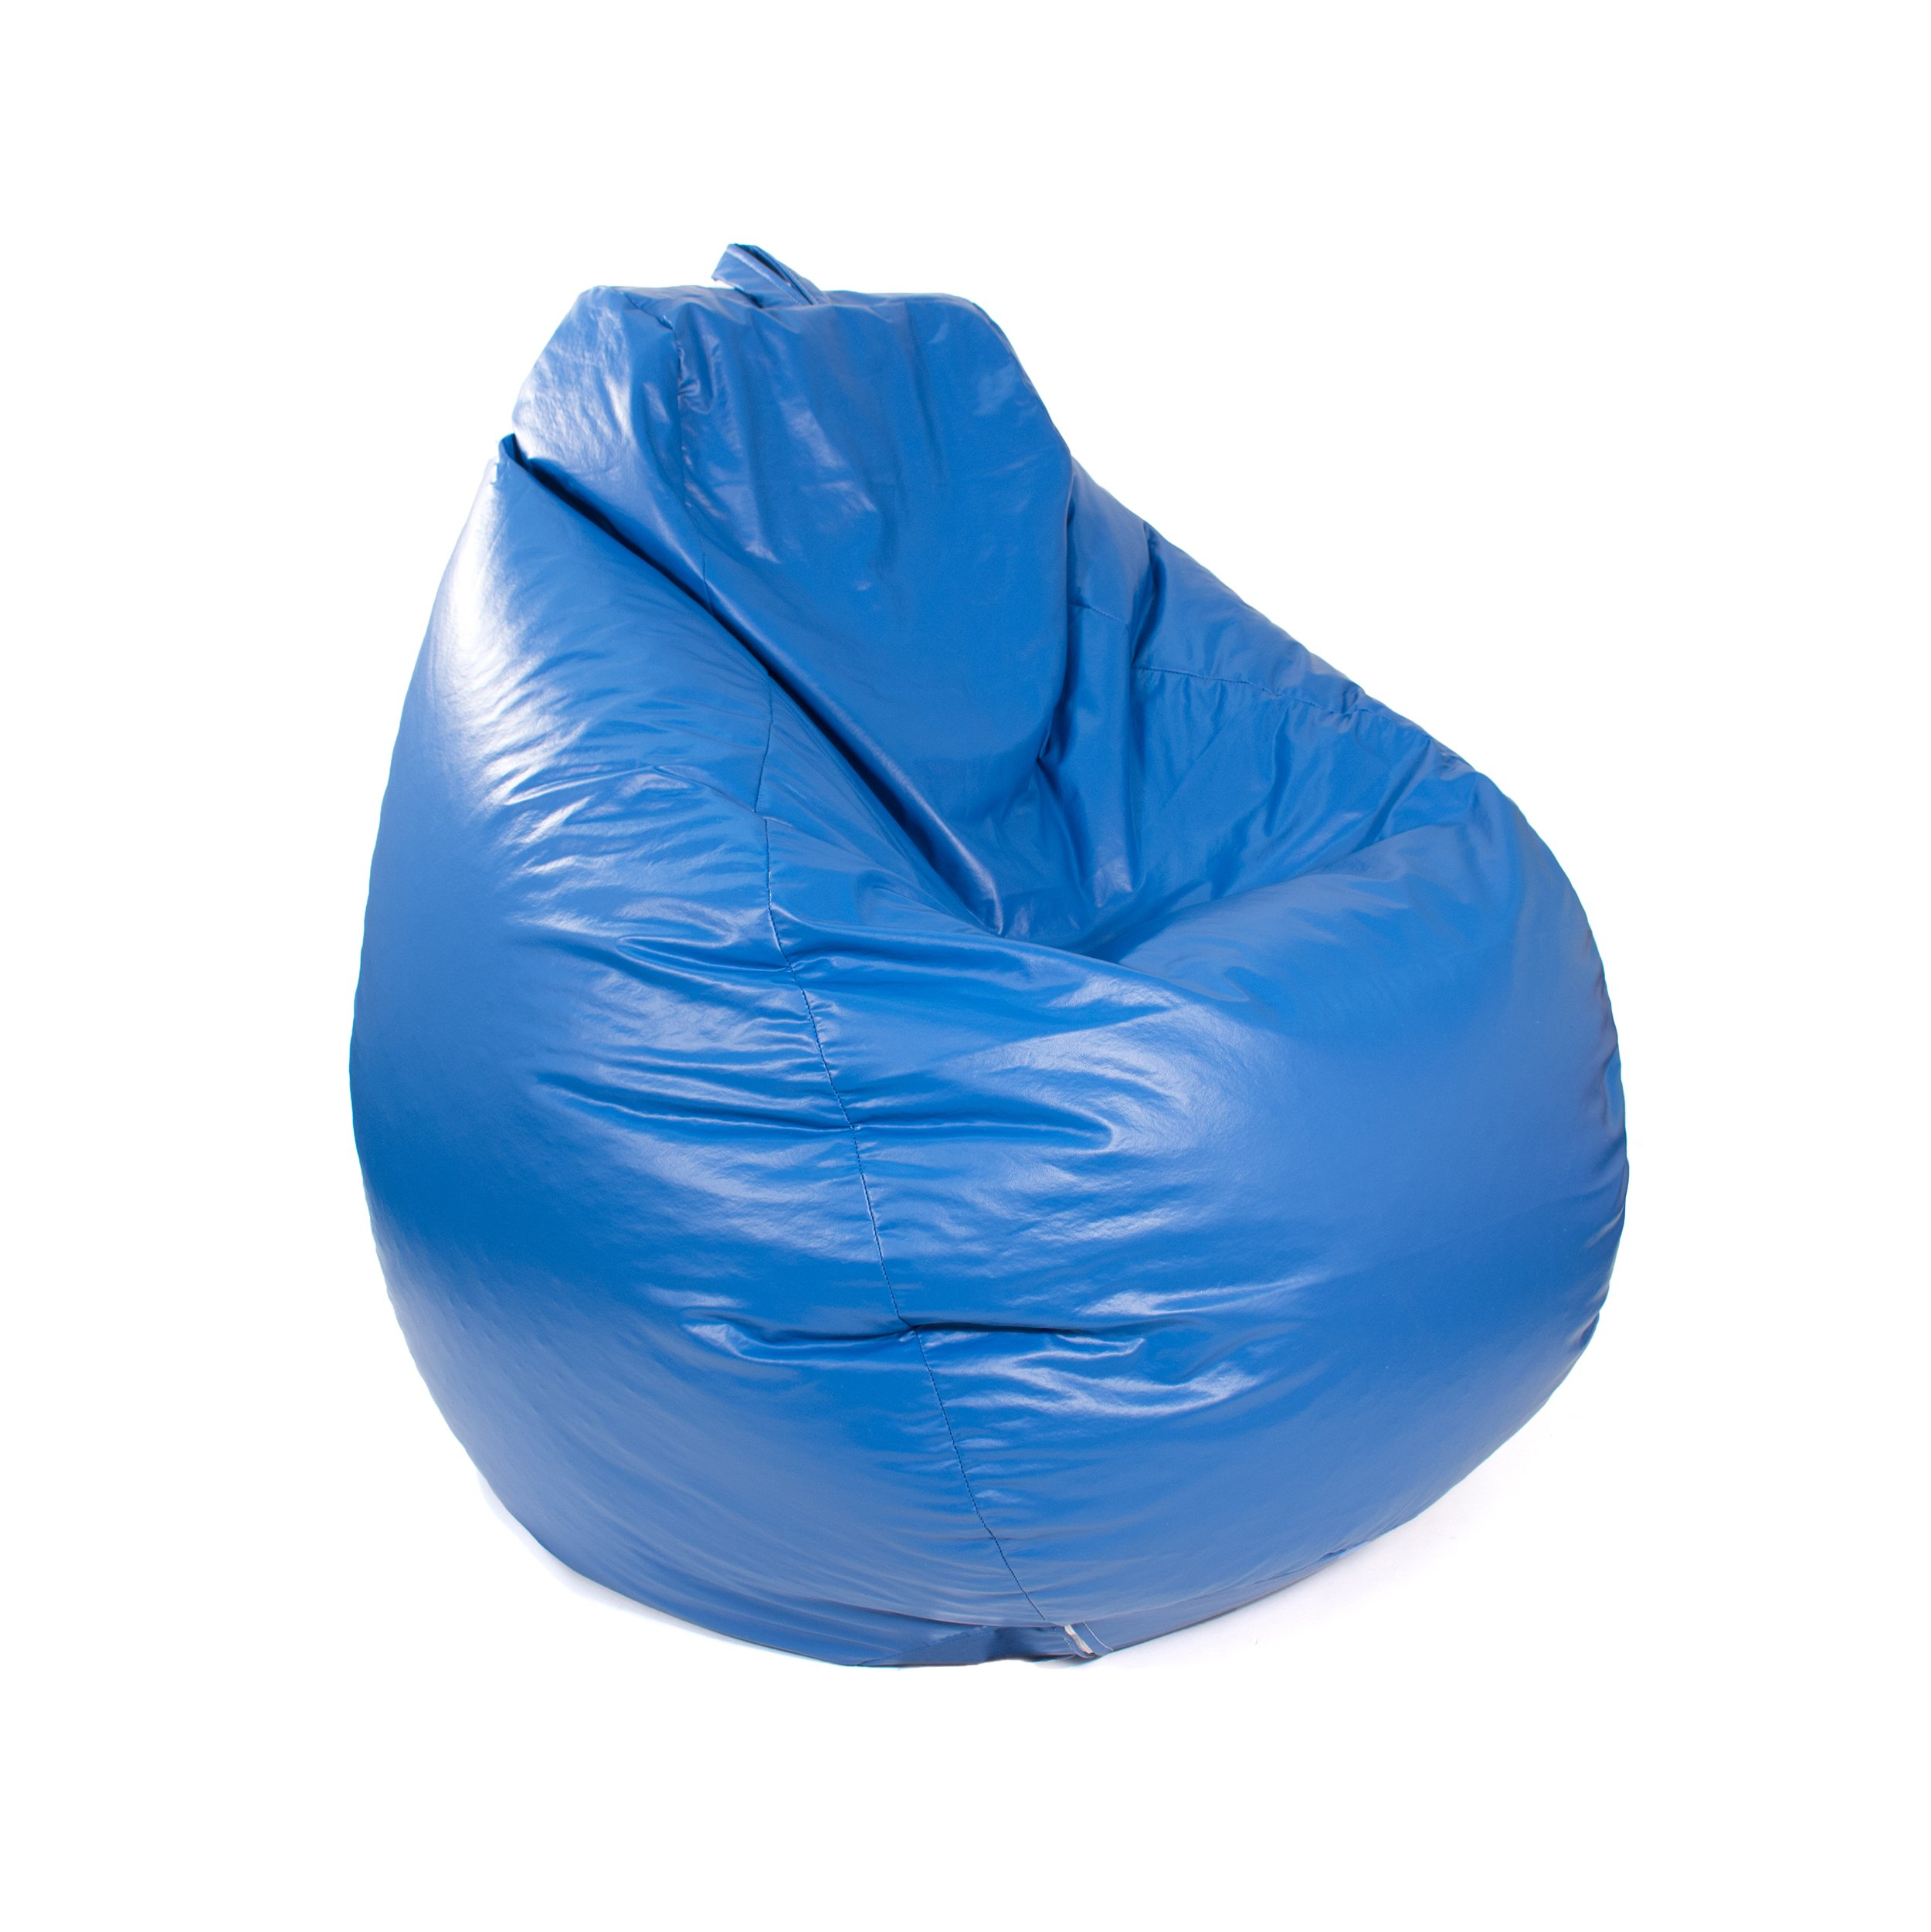 Gold Medal Bean Bags Tear Drop Leather Look Vinyl Bean Bag, Large, Medium Blue